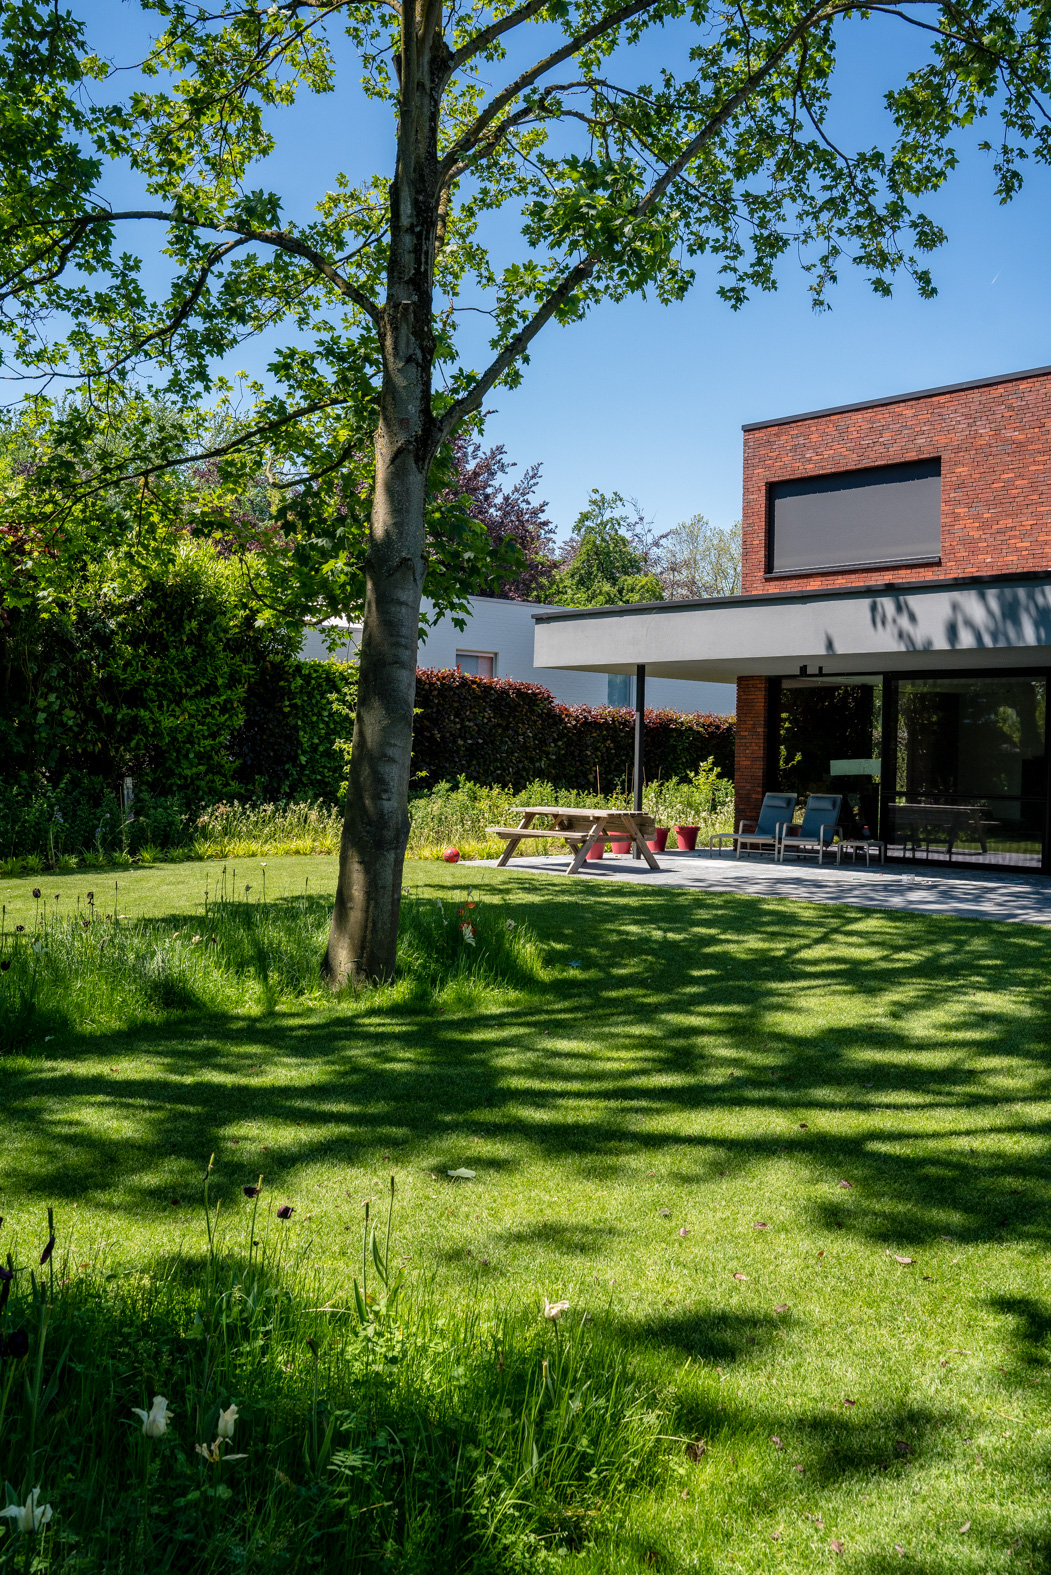 052021 WVV Hogerhuis U665 LOWRES03 | Baeyens & Beck architecten Gent | architect nieuwbouw renovatie interieur | high end | architectenbureau